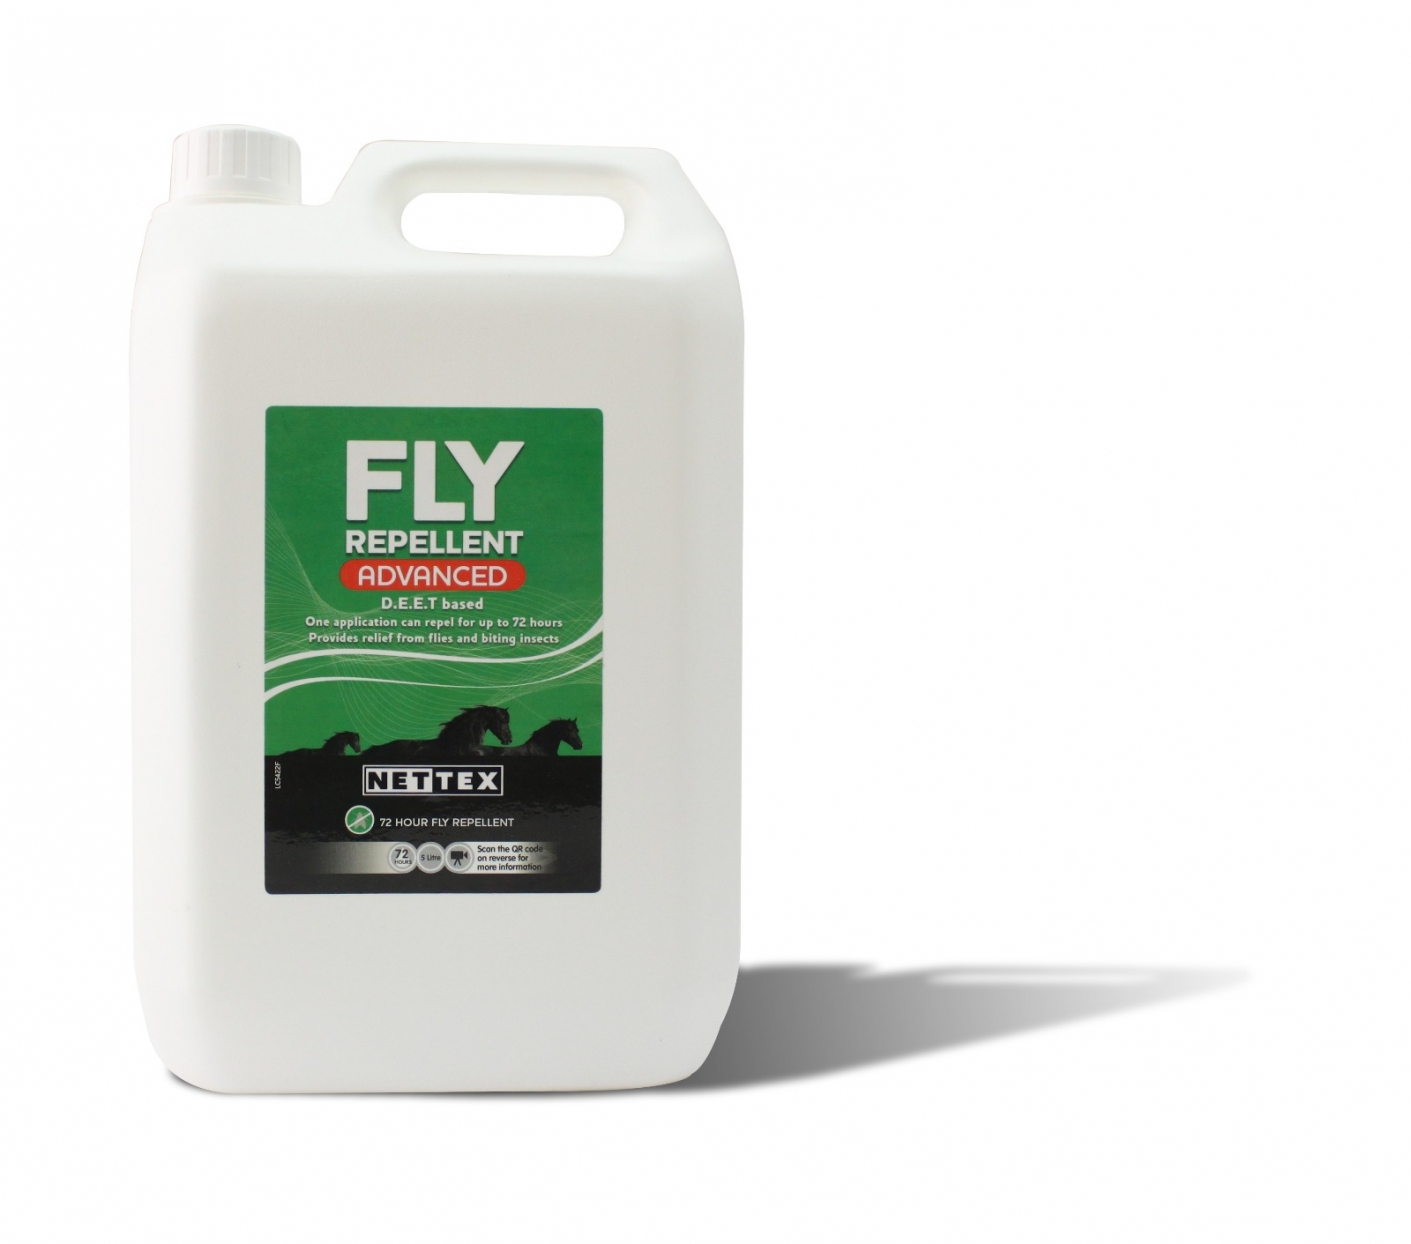 Nettex Advanced Fly Repellent